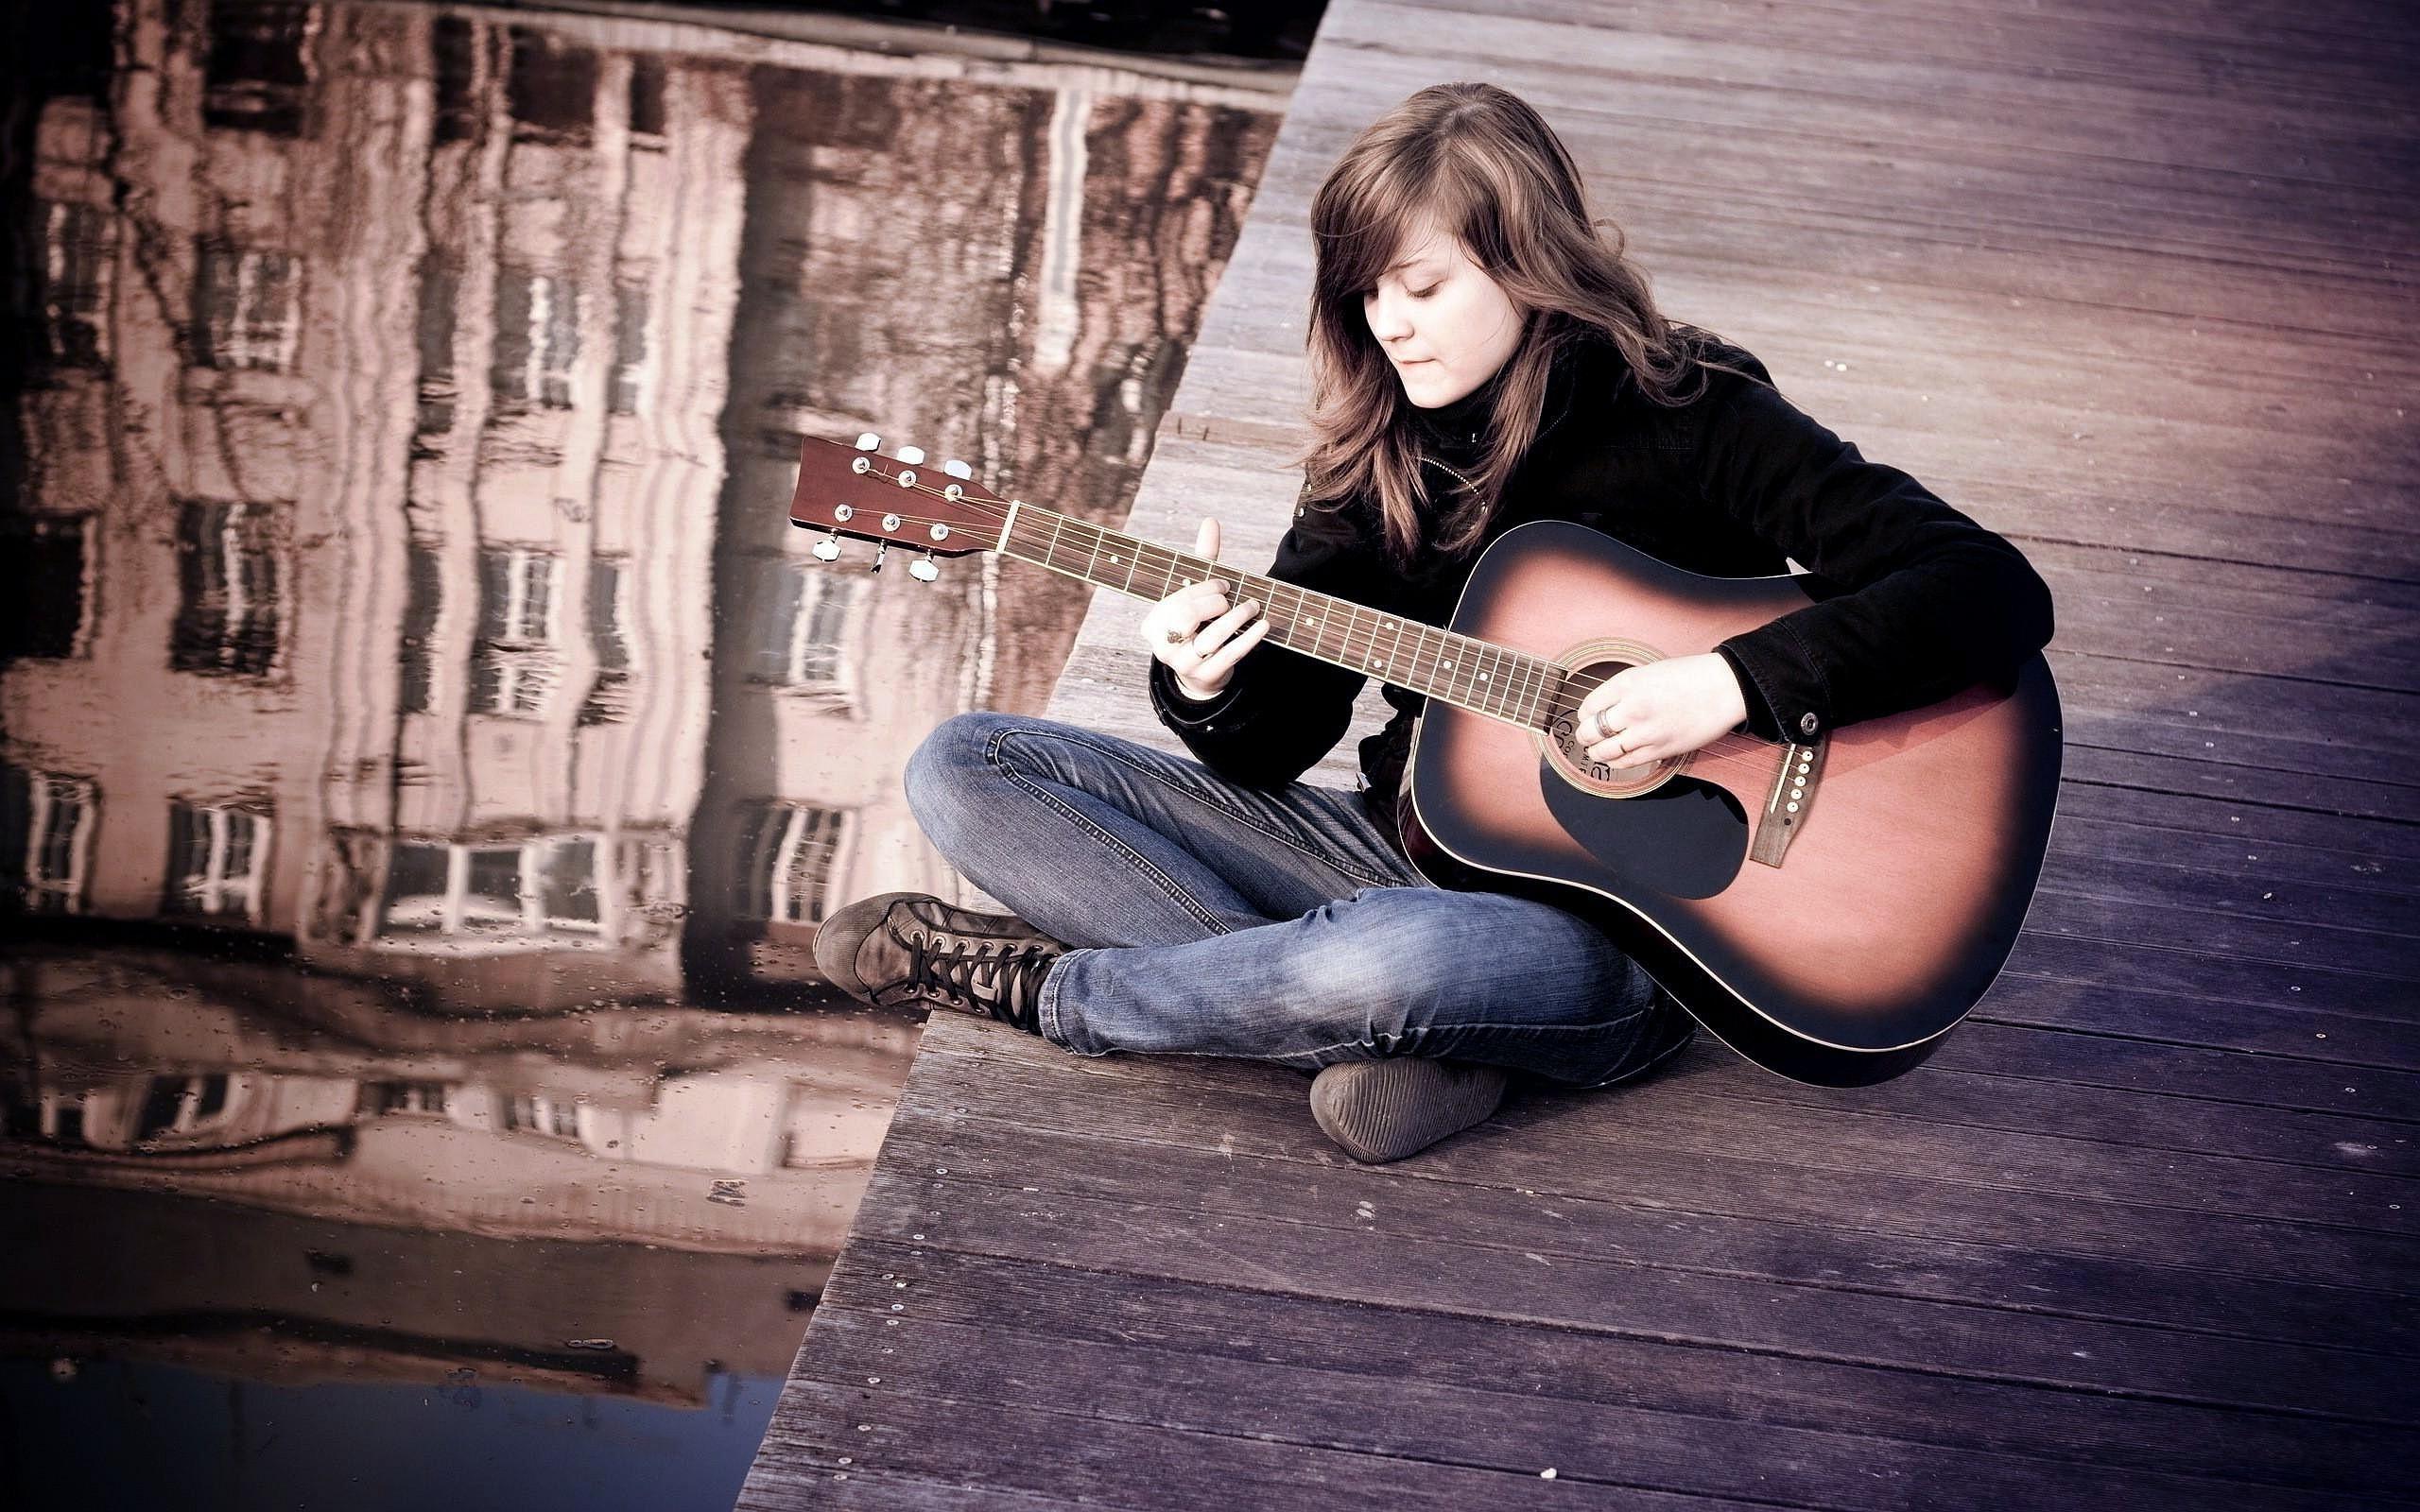 Res: 2560x1600, Girl Playing Guitar